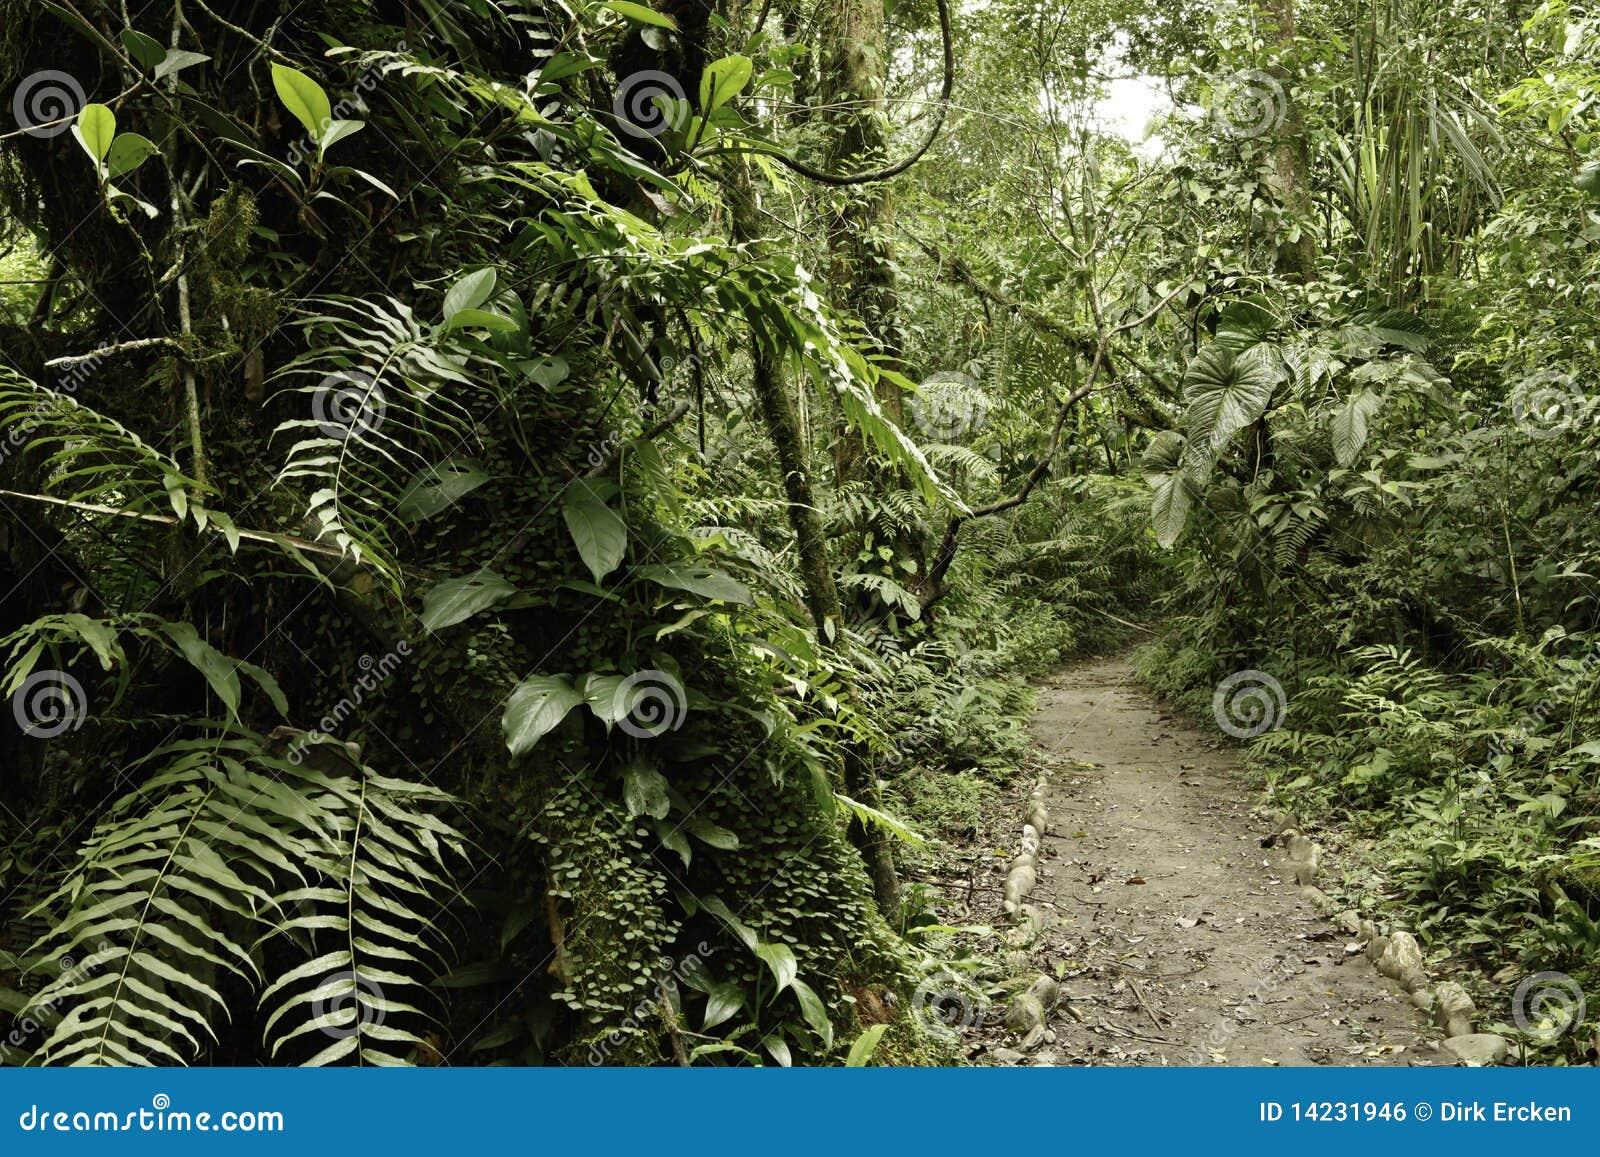 rain forest green tropical amazon jungle stock photo